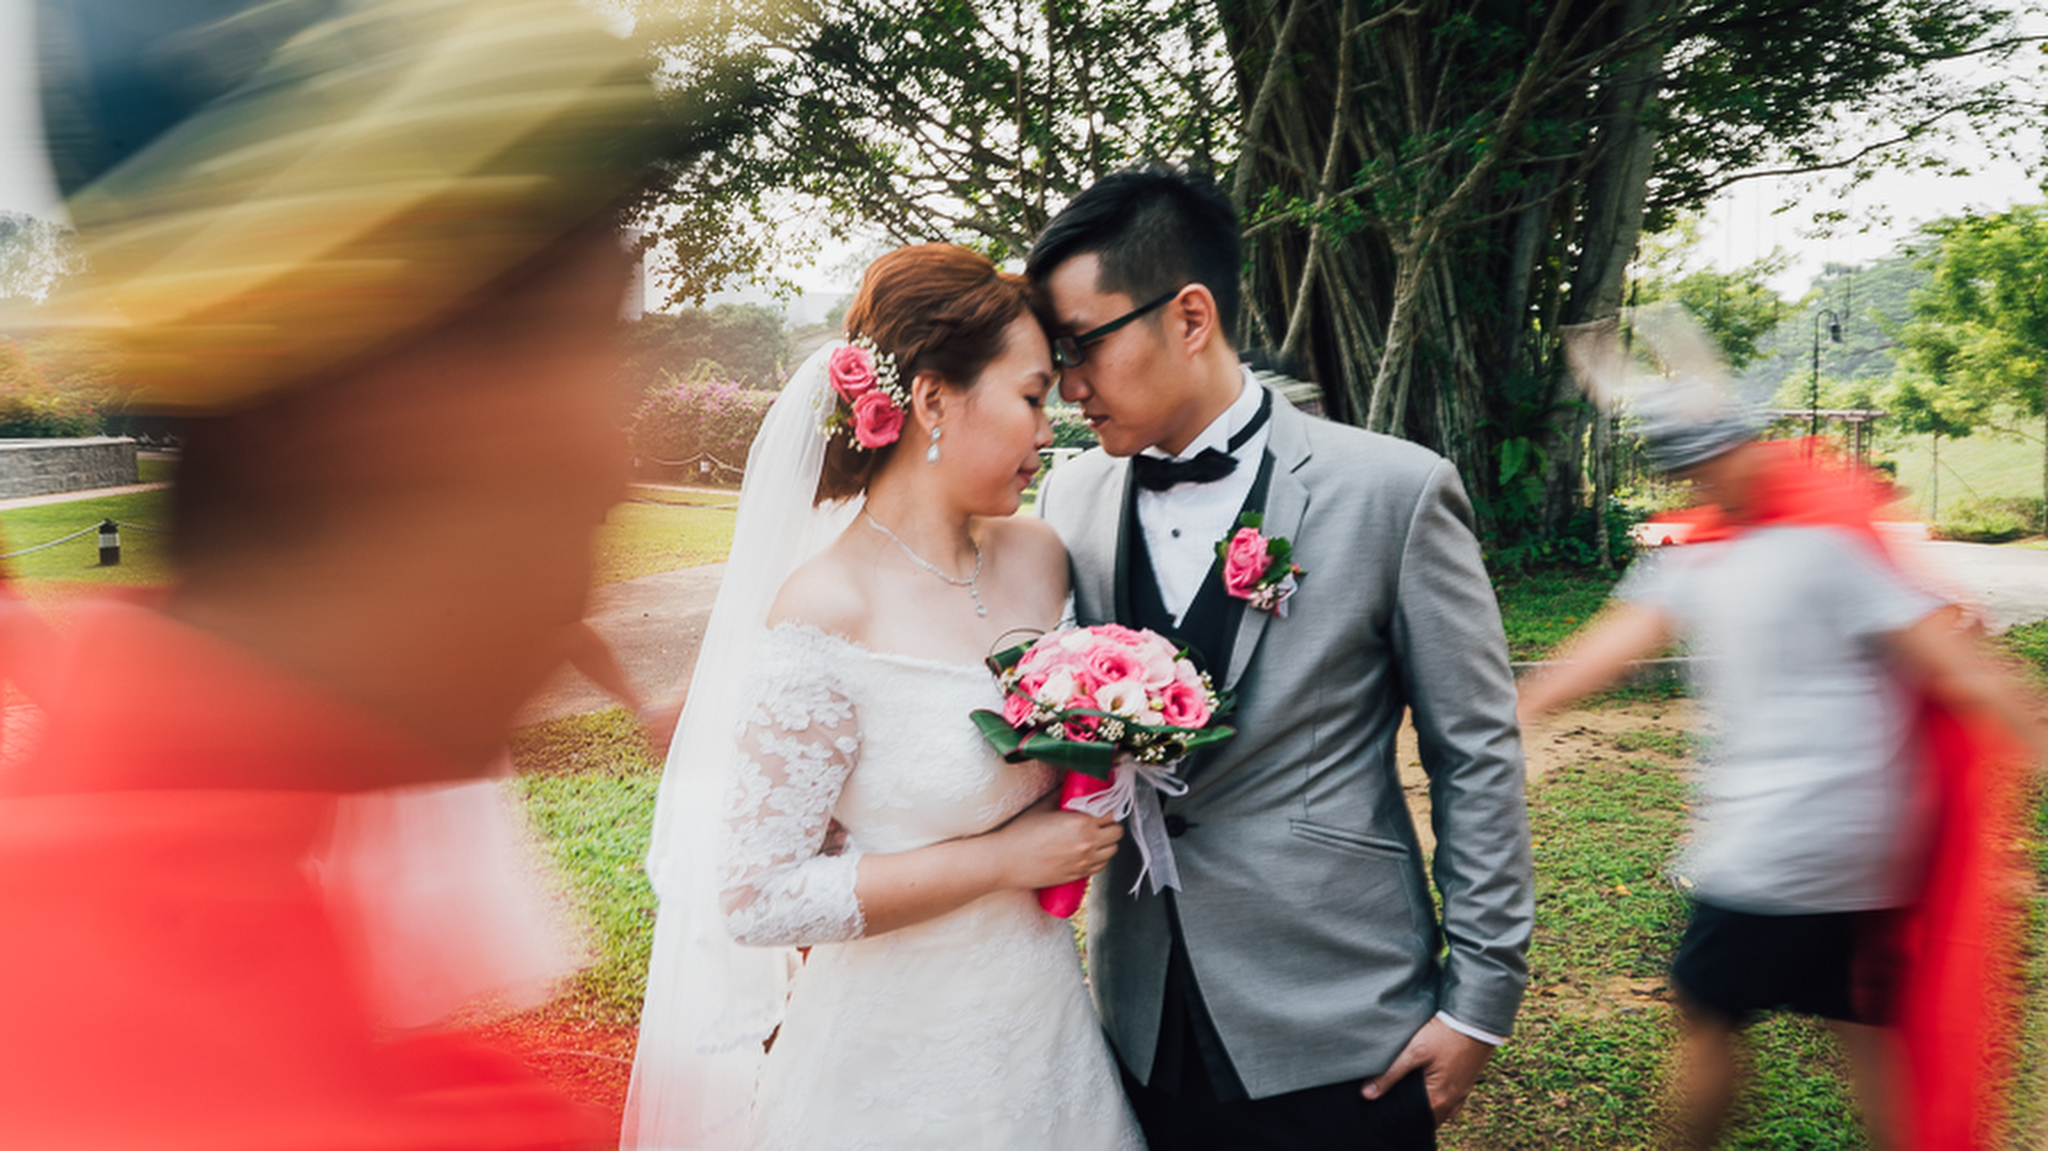 Singapore Wedding Photographer - Alvin & Mischelle Actual Day Wedding (42 of 86).JPG